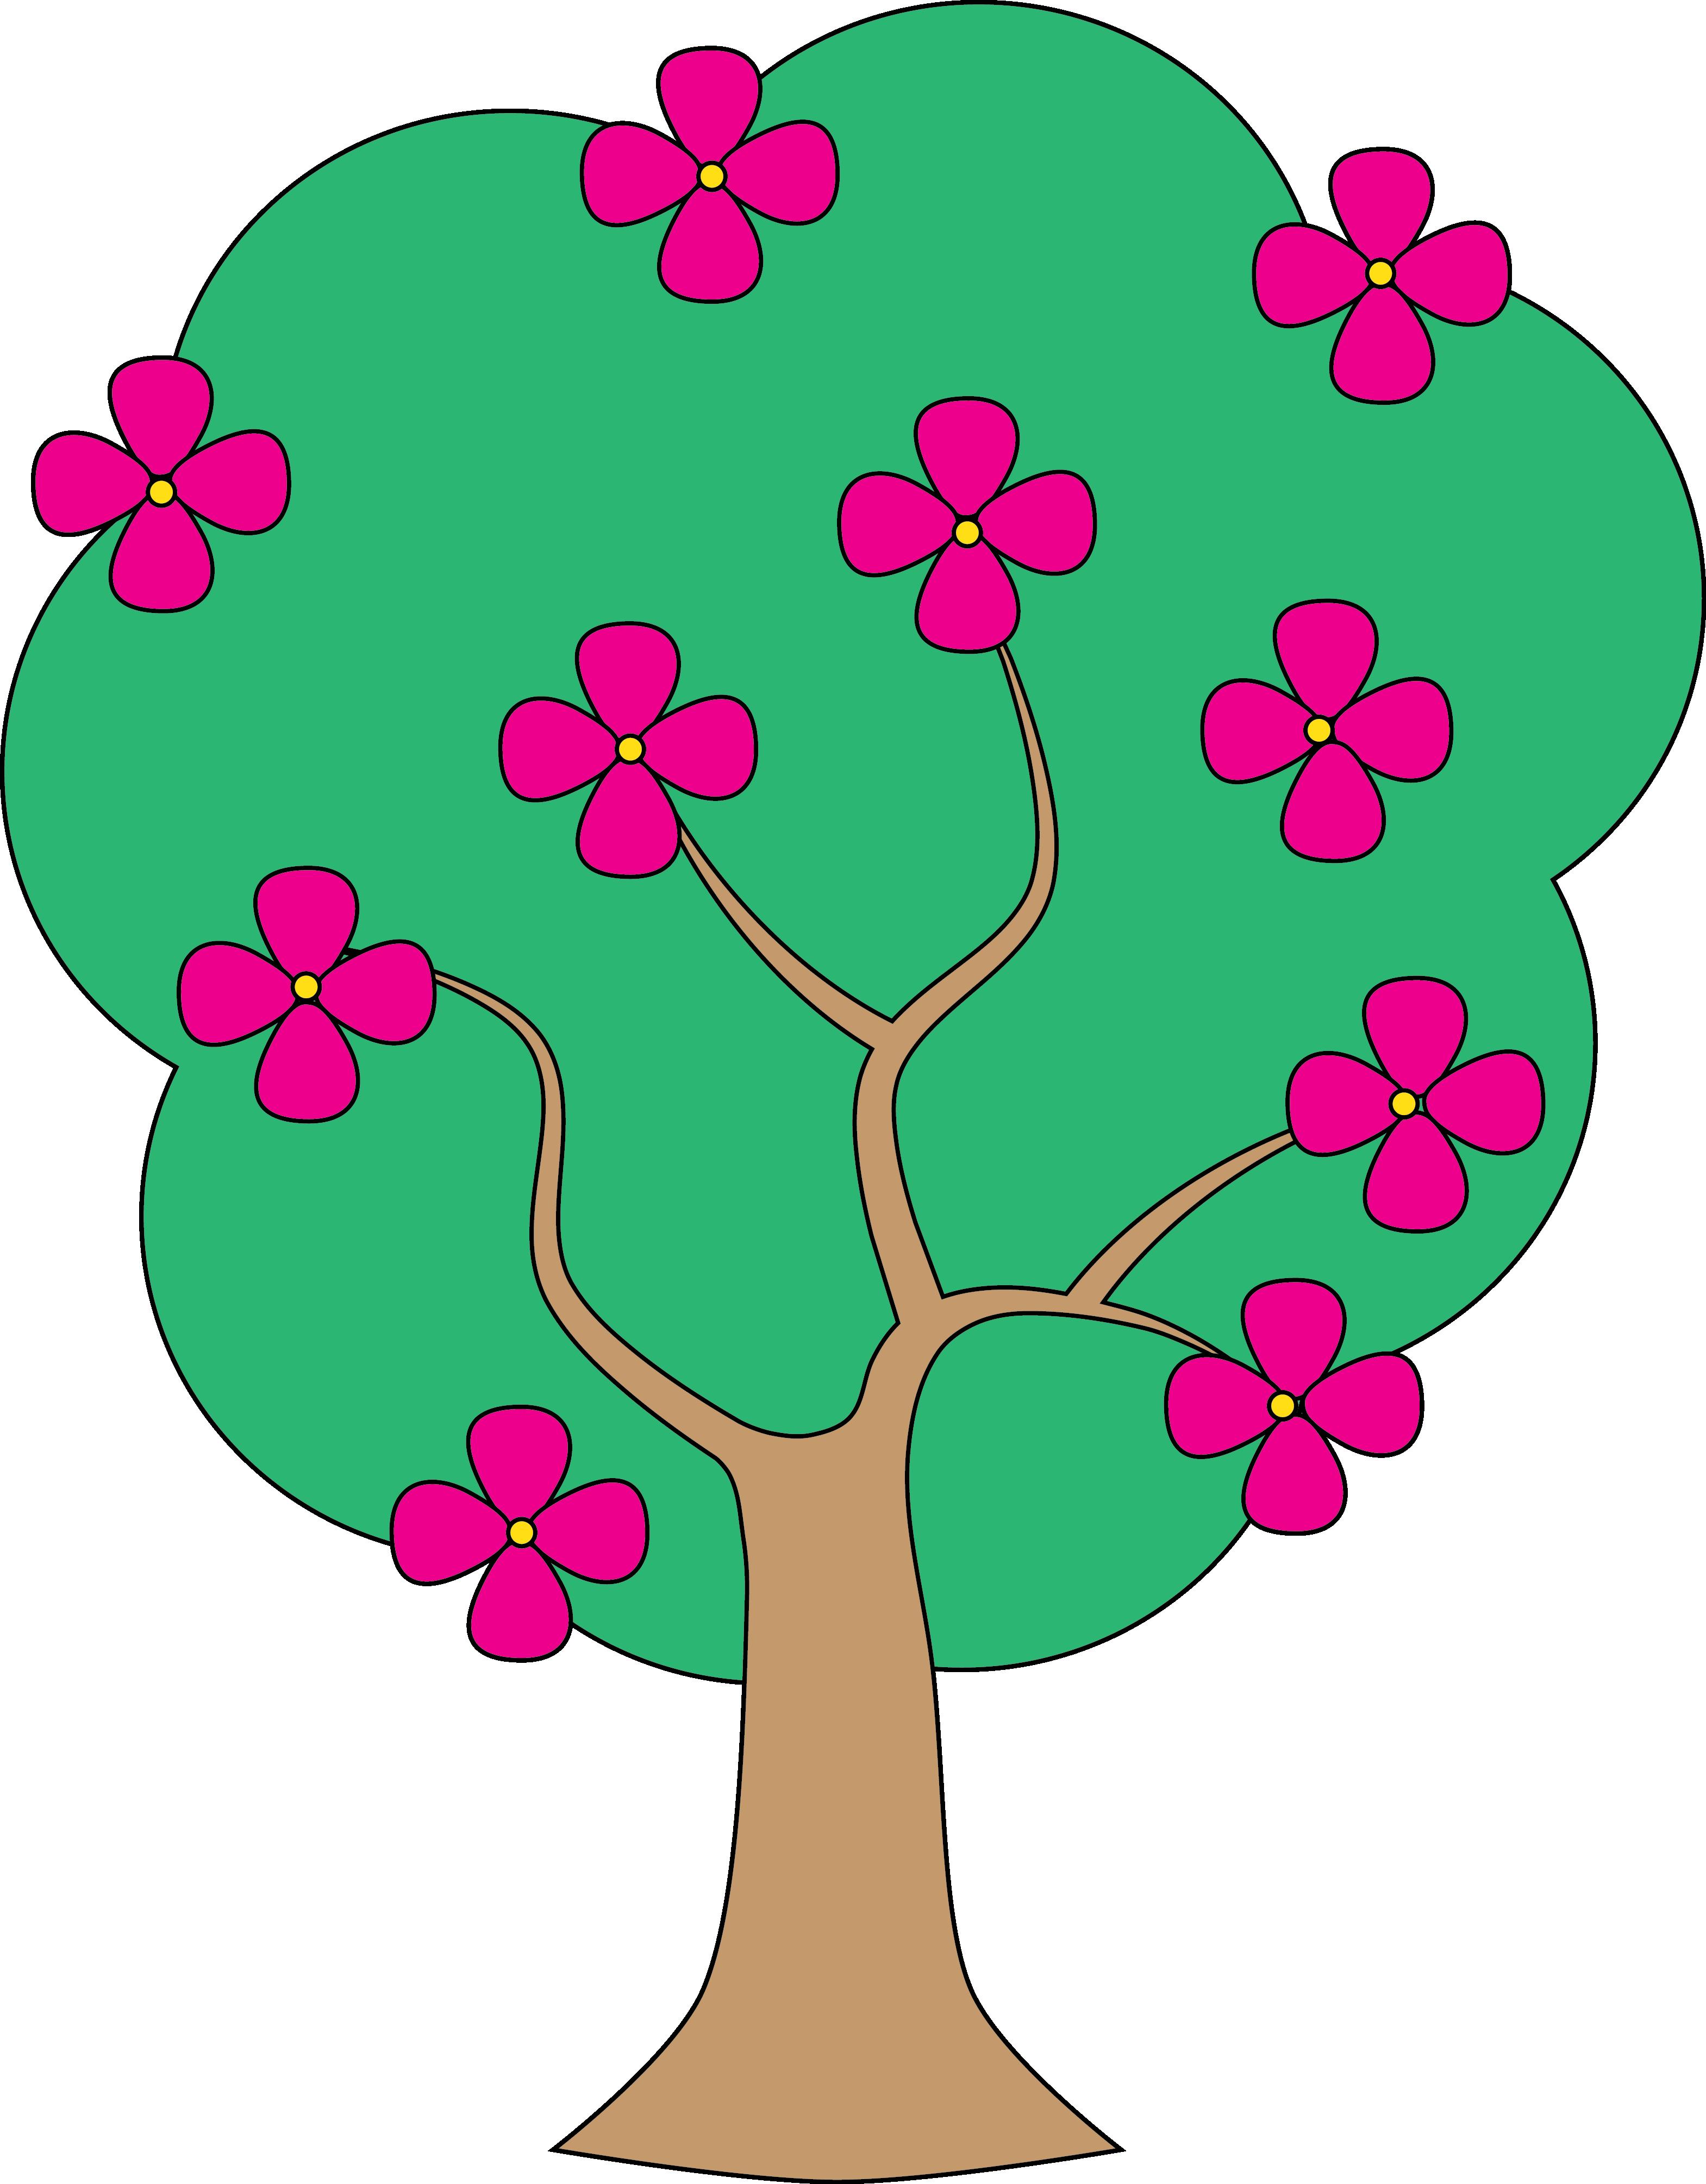 Flower Tree Clipart.